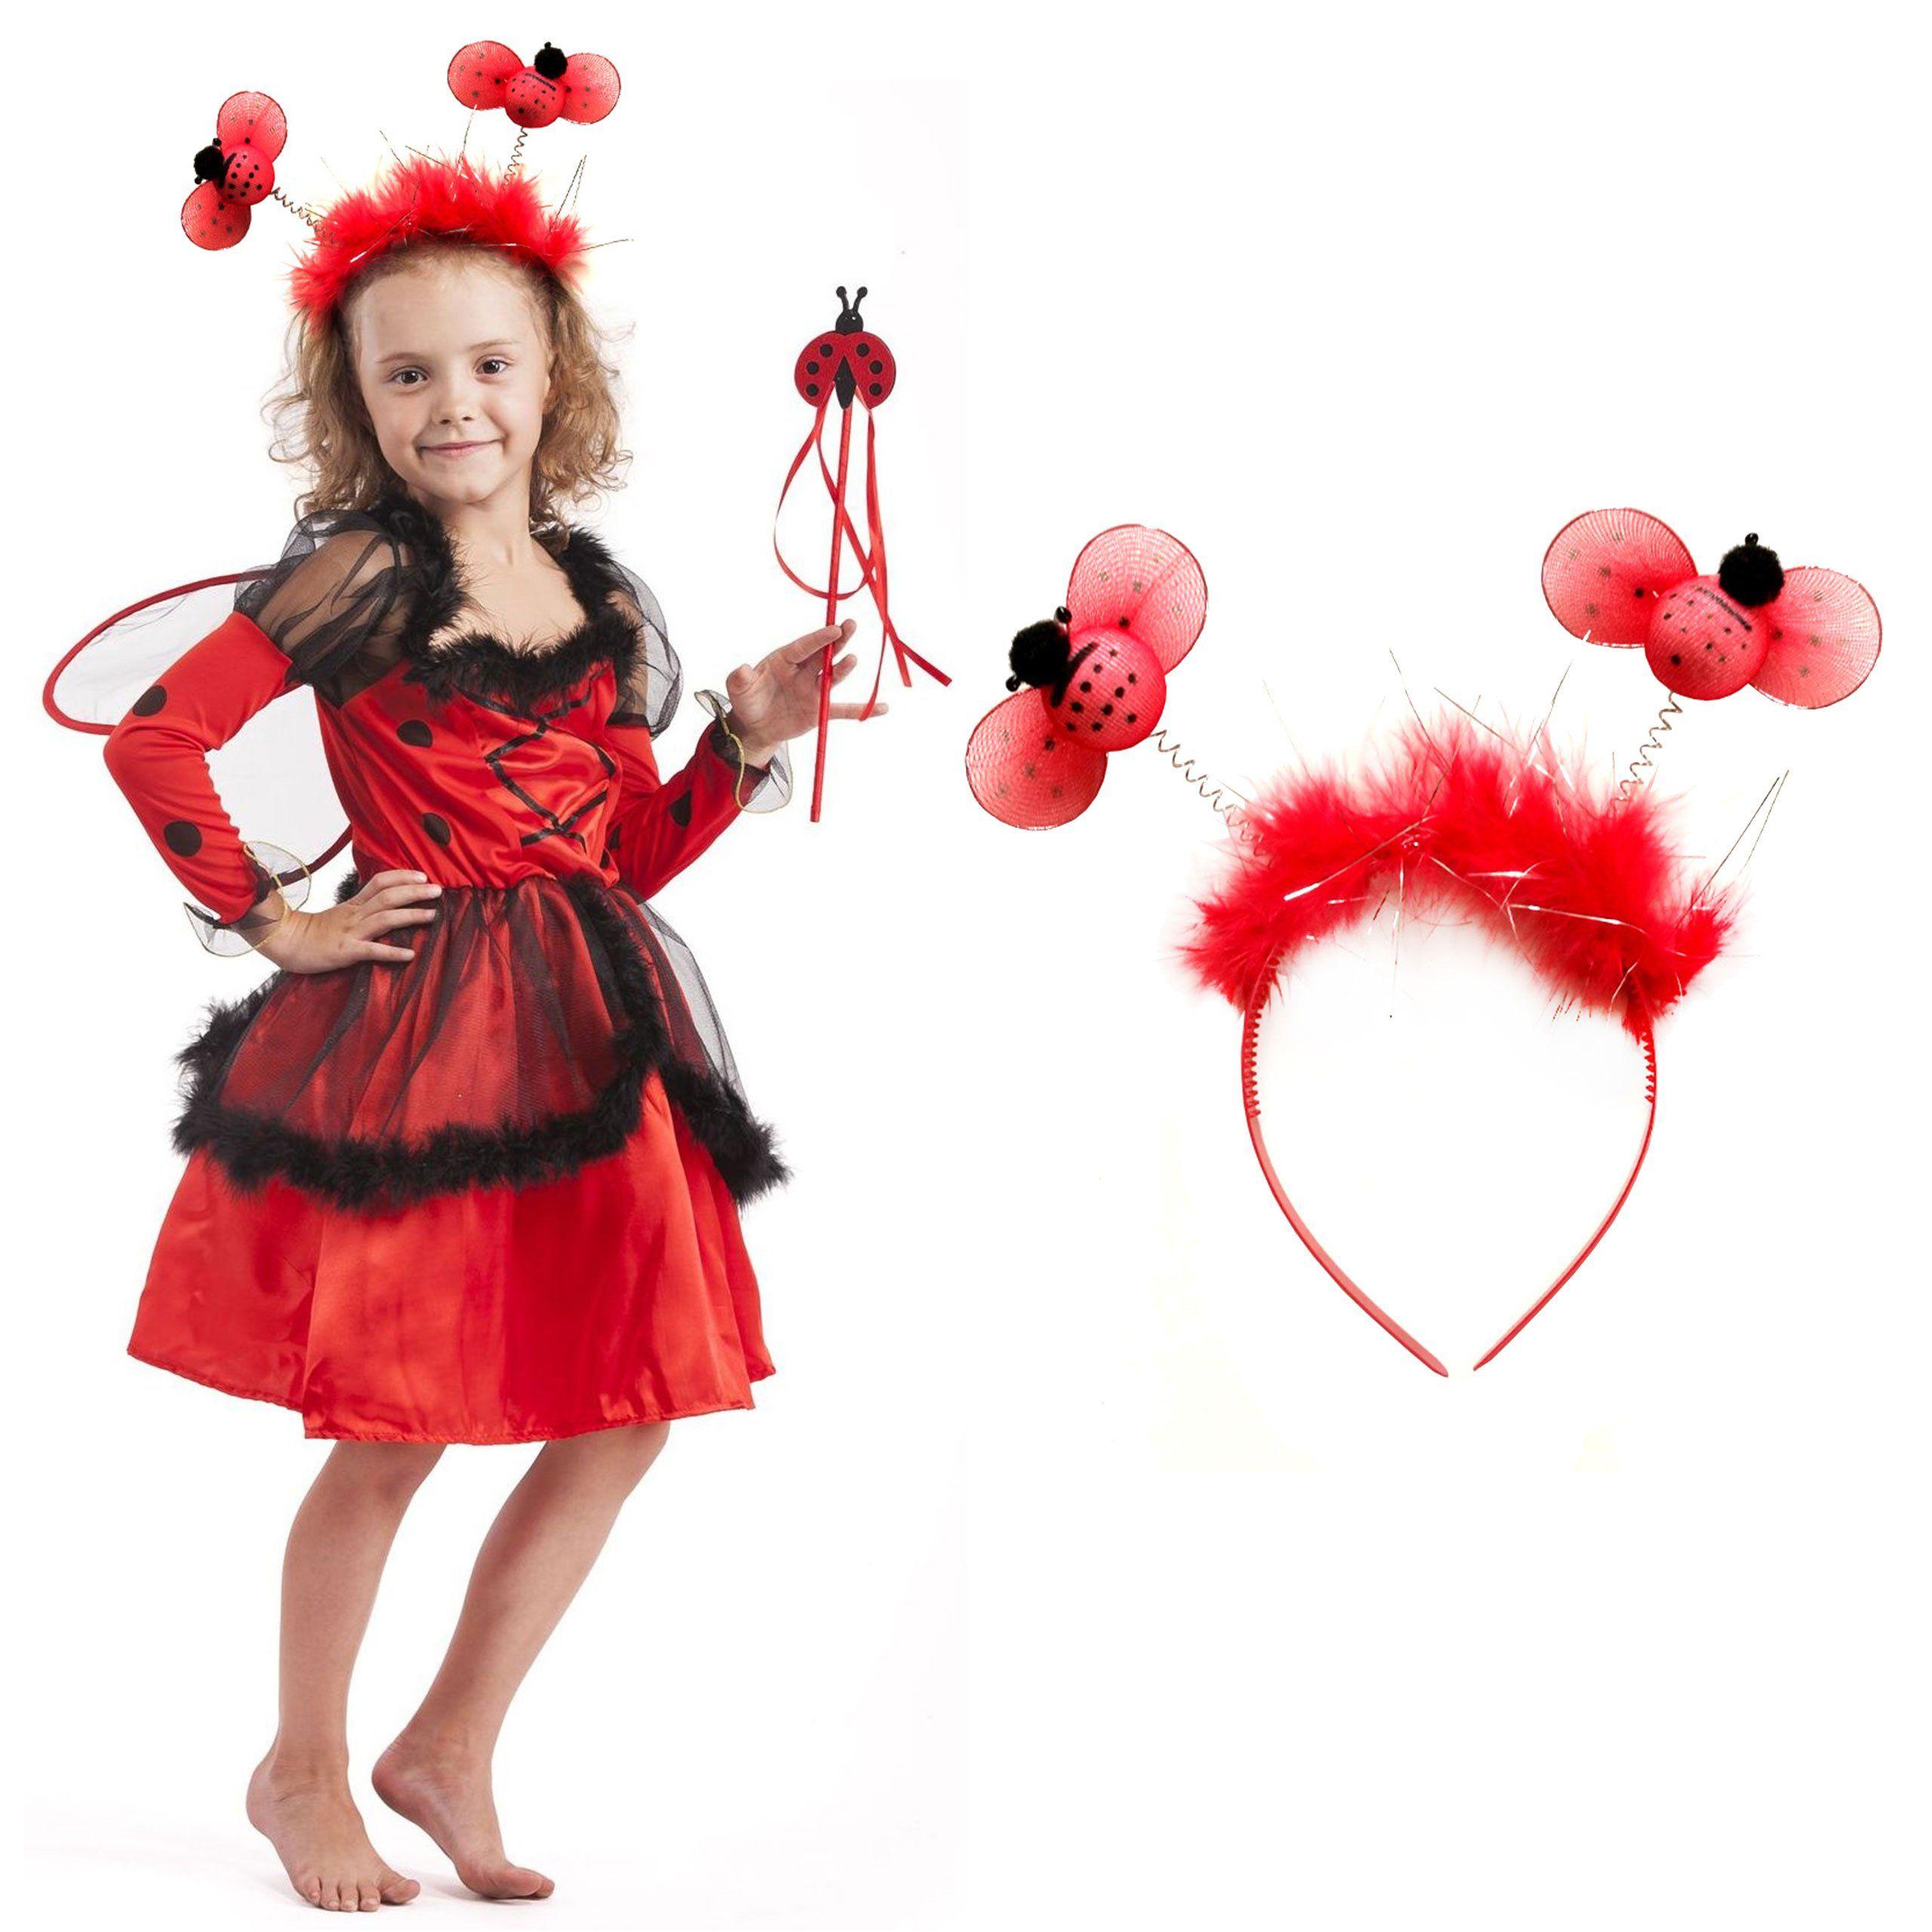 b63bc9a18e824d Strój Biedronka Miraculum Kostium Sukienka Skrzydełka Opaska dla dziecka  110-116cm https://